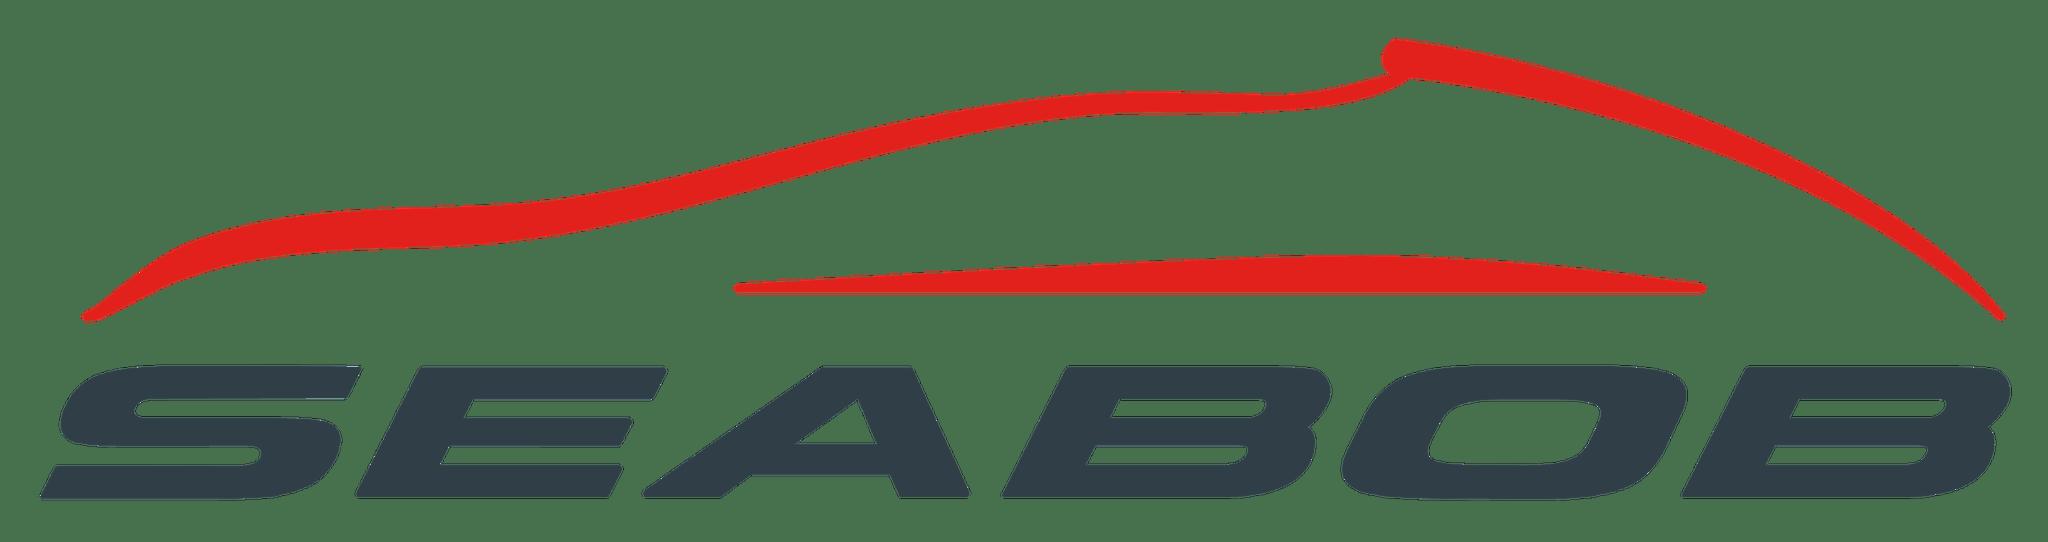 Seabob logo